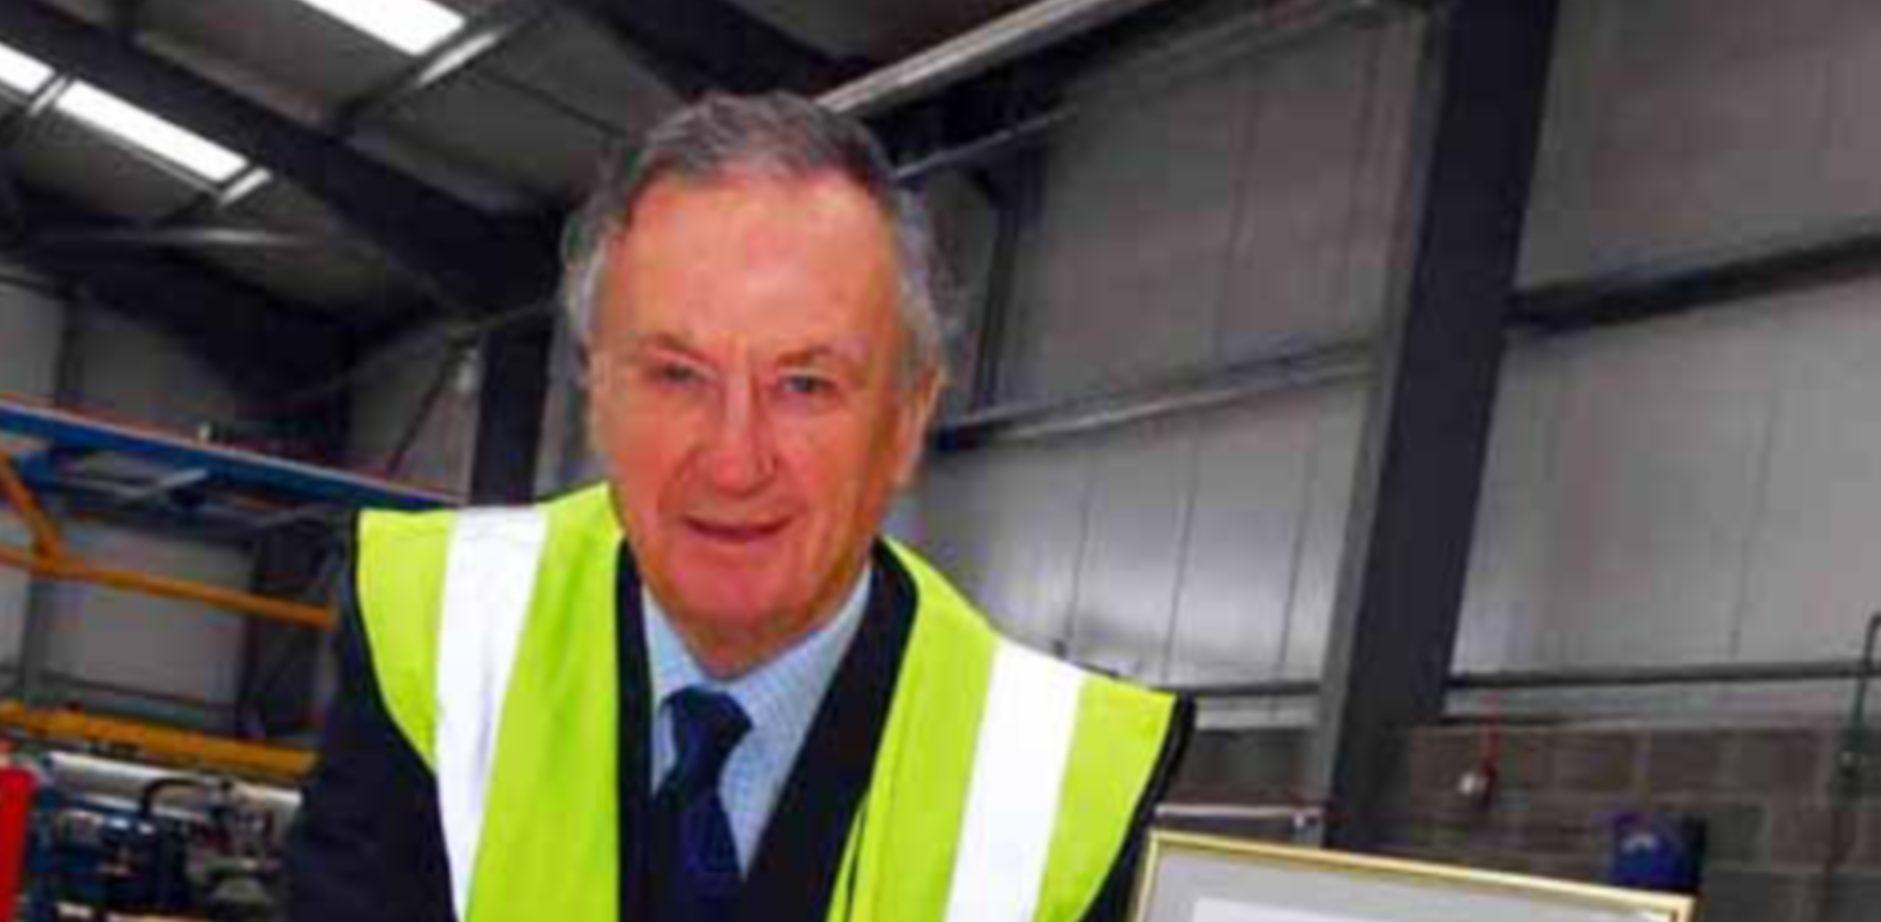 Muir Group chairman John Muir